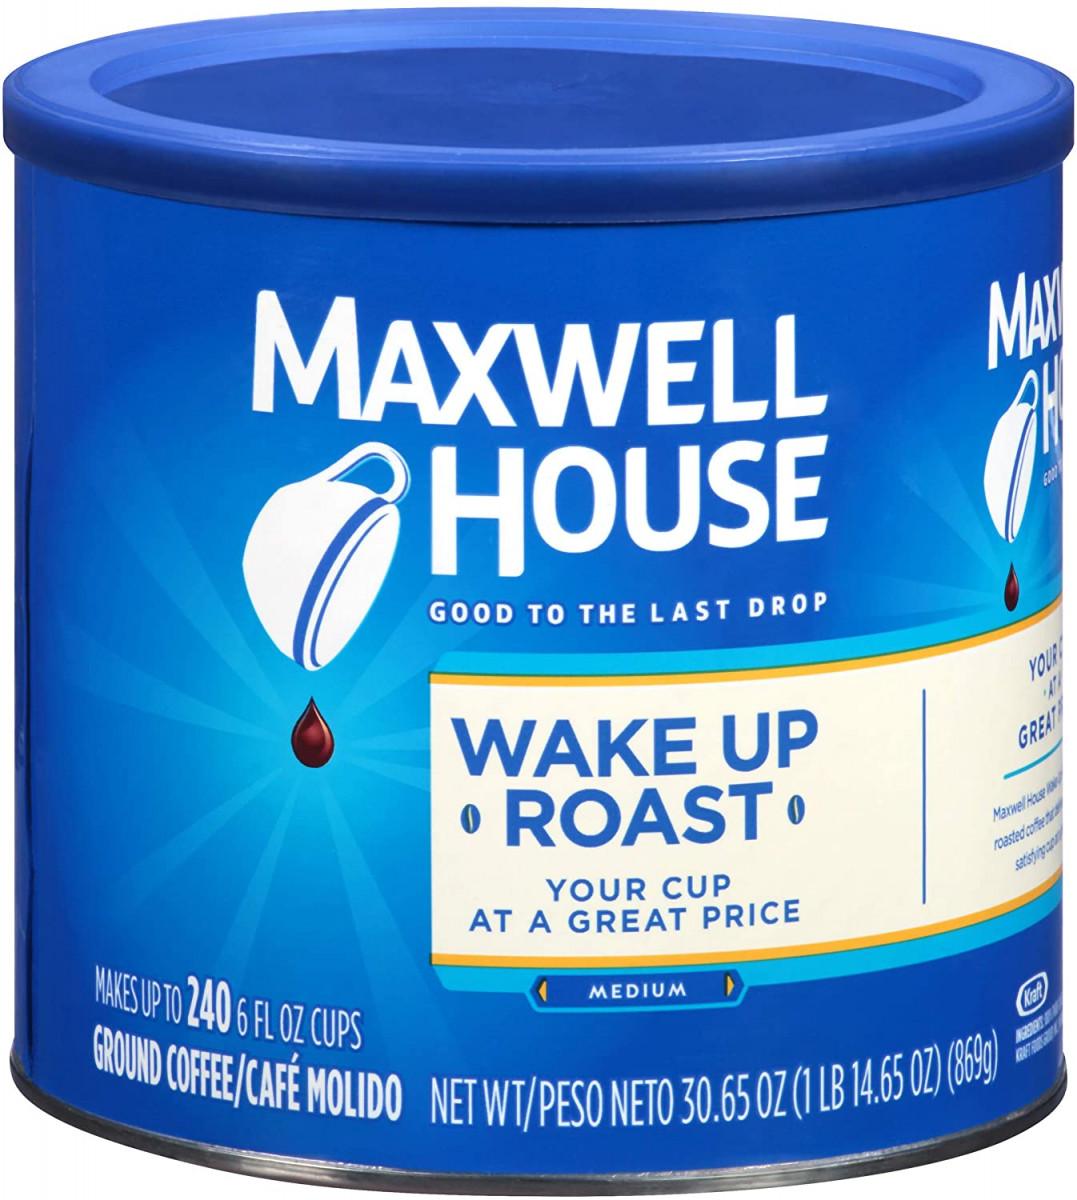 Maxwell House Wake Up Roast Medium Roast Ground Coffee (30.65 oz Canister)  – 44% PRICE DROP+SUB/SAVE!